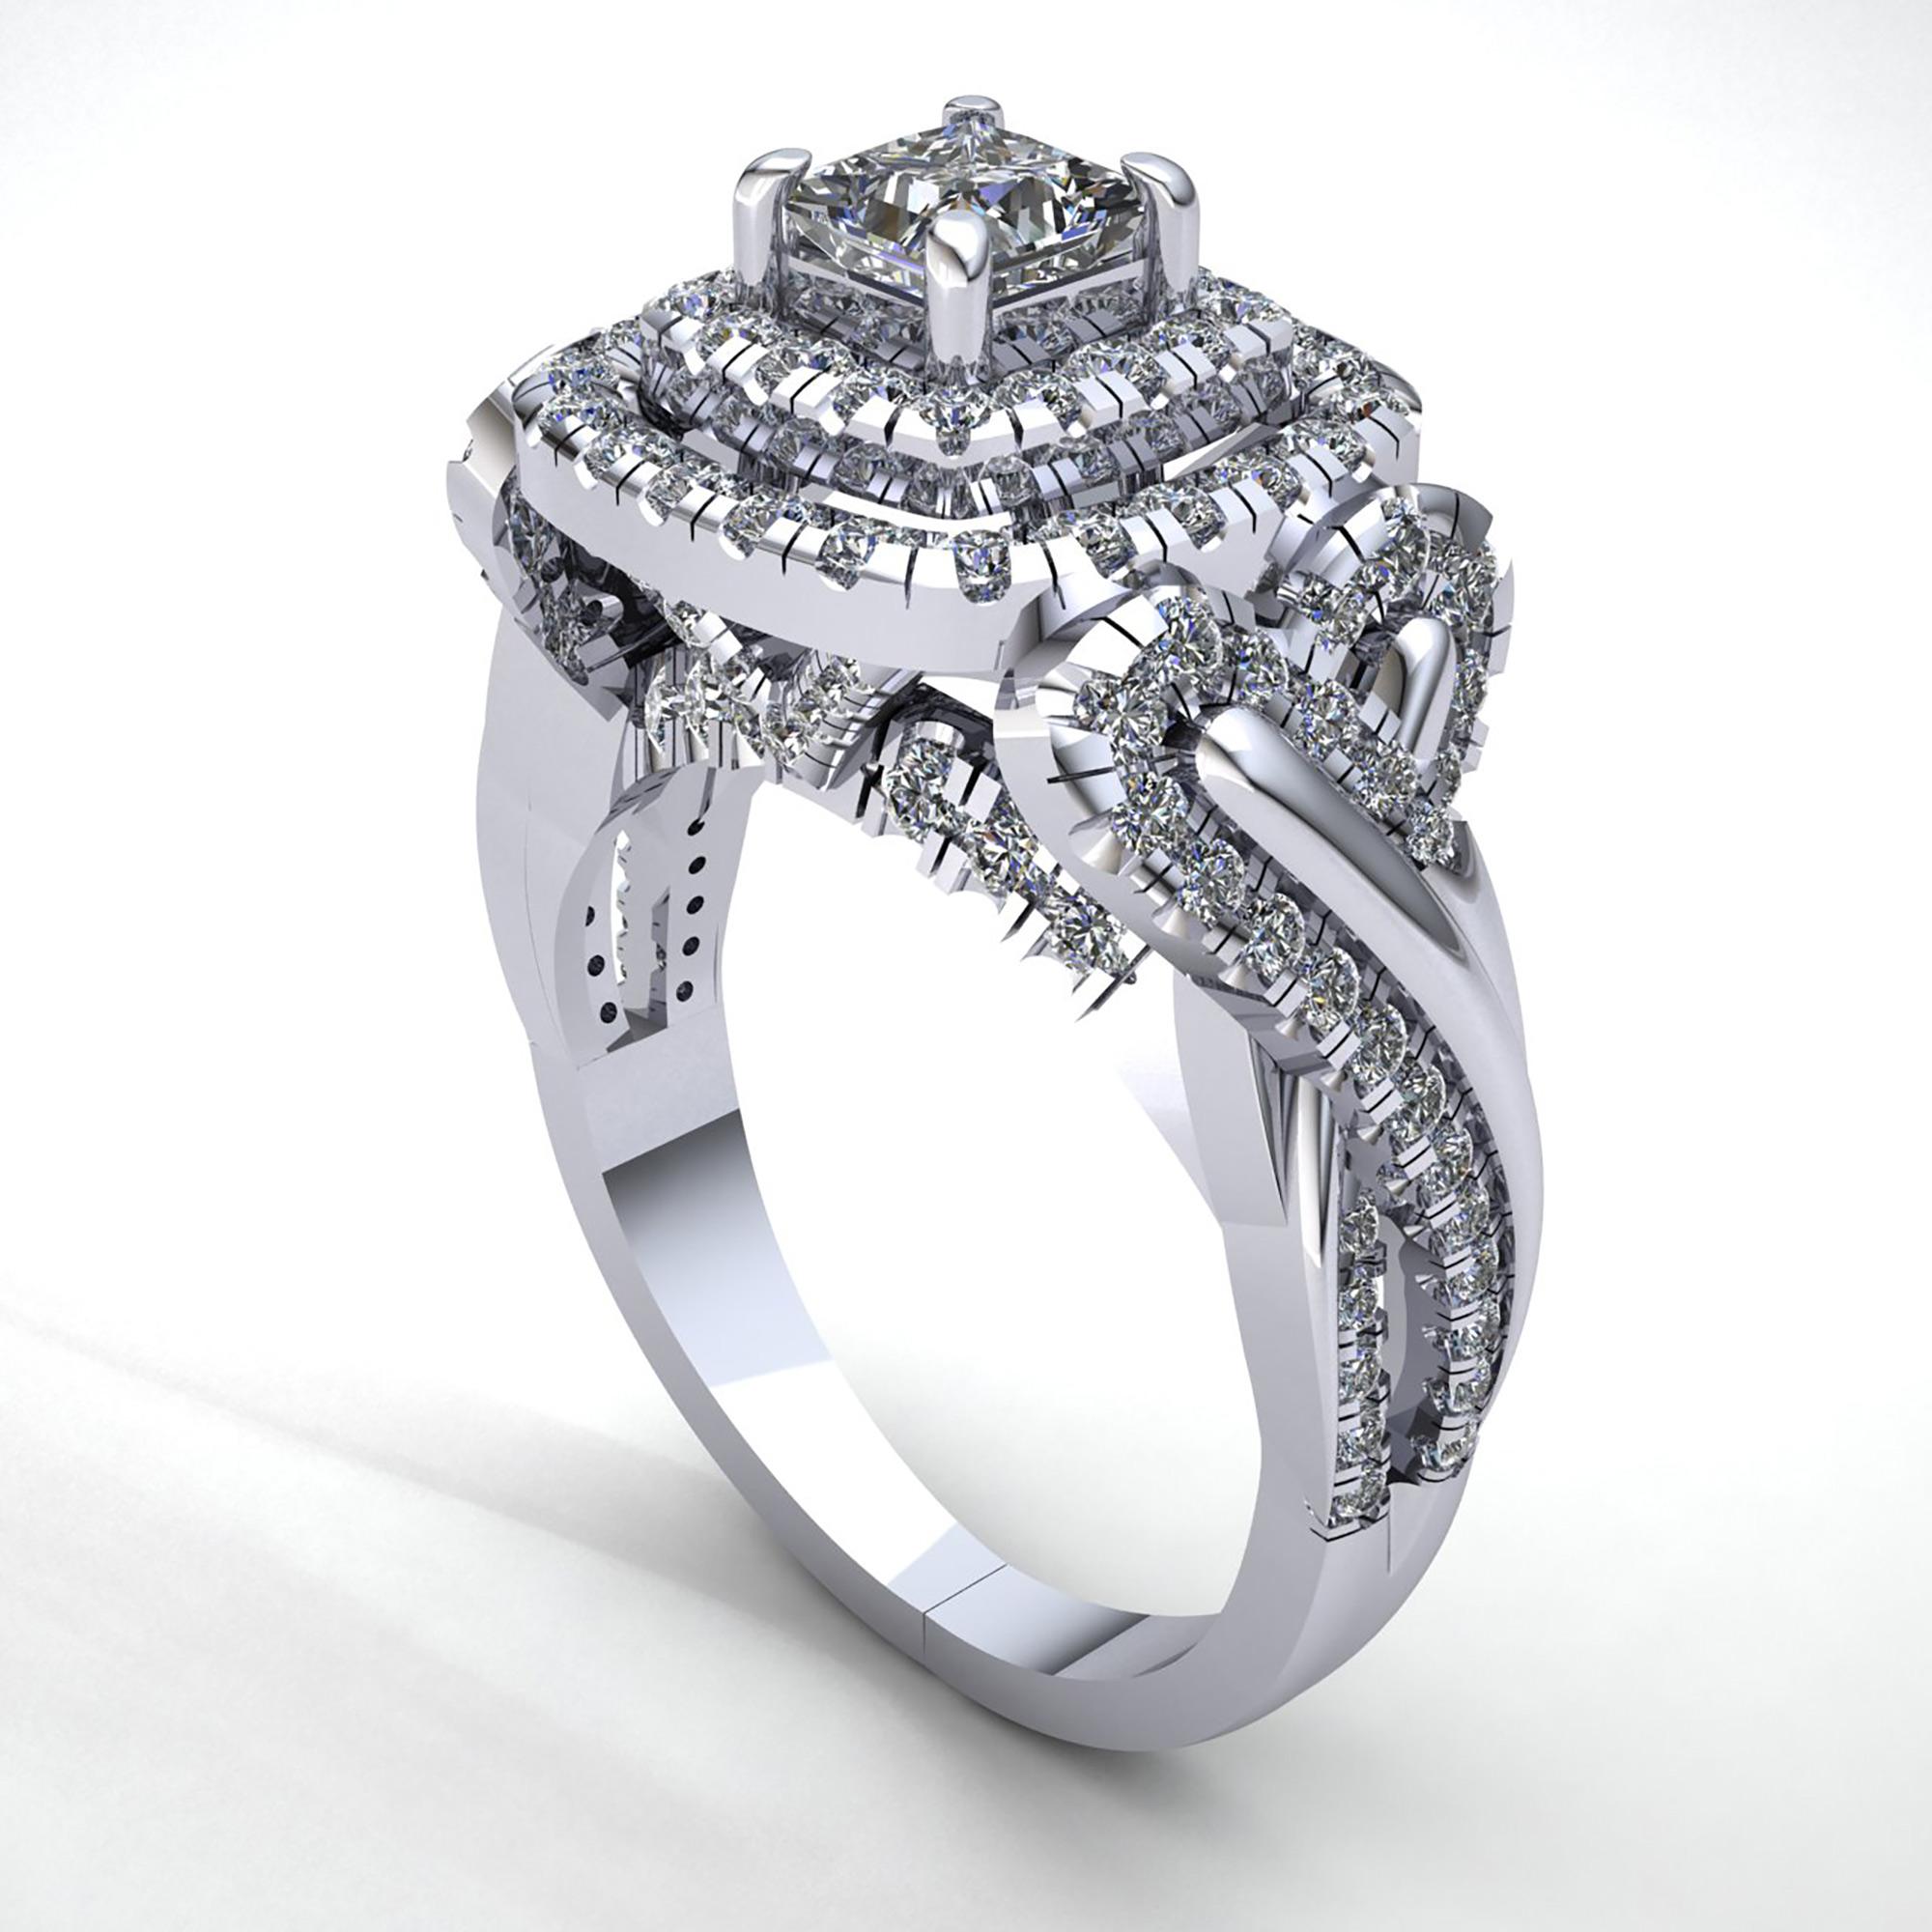 Natural-3-Quilates-Diamante-Talla-Princesa-Mujer-Doble-Halo-Anillo-de-Compromiso miniatura 10